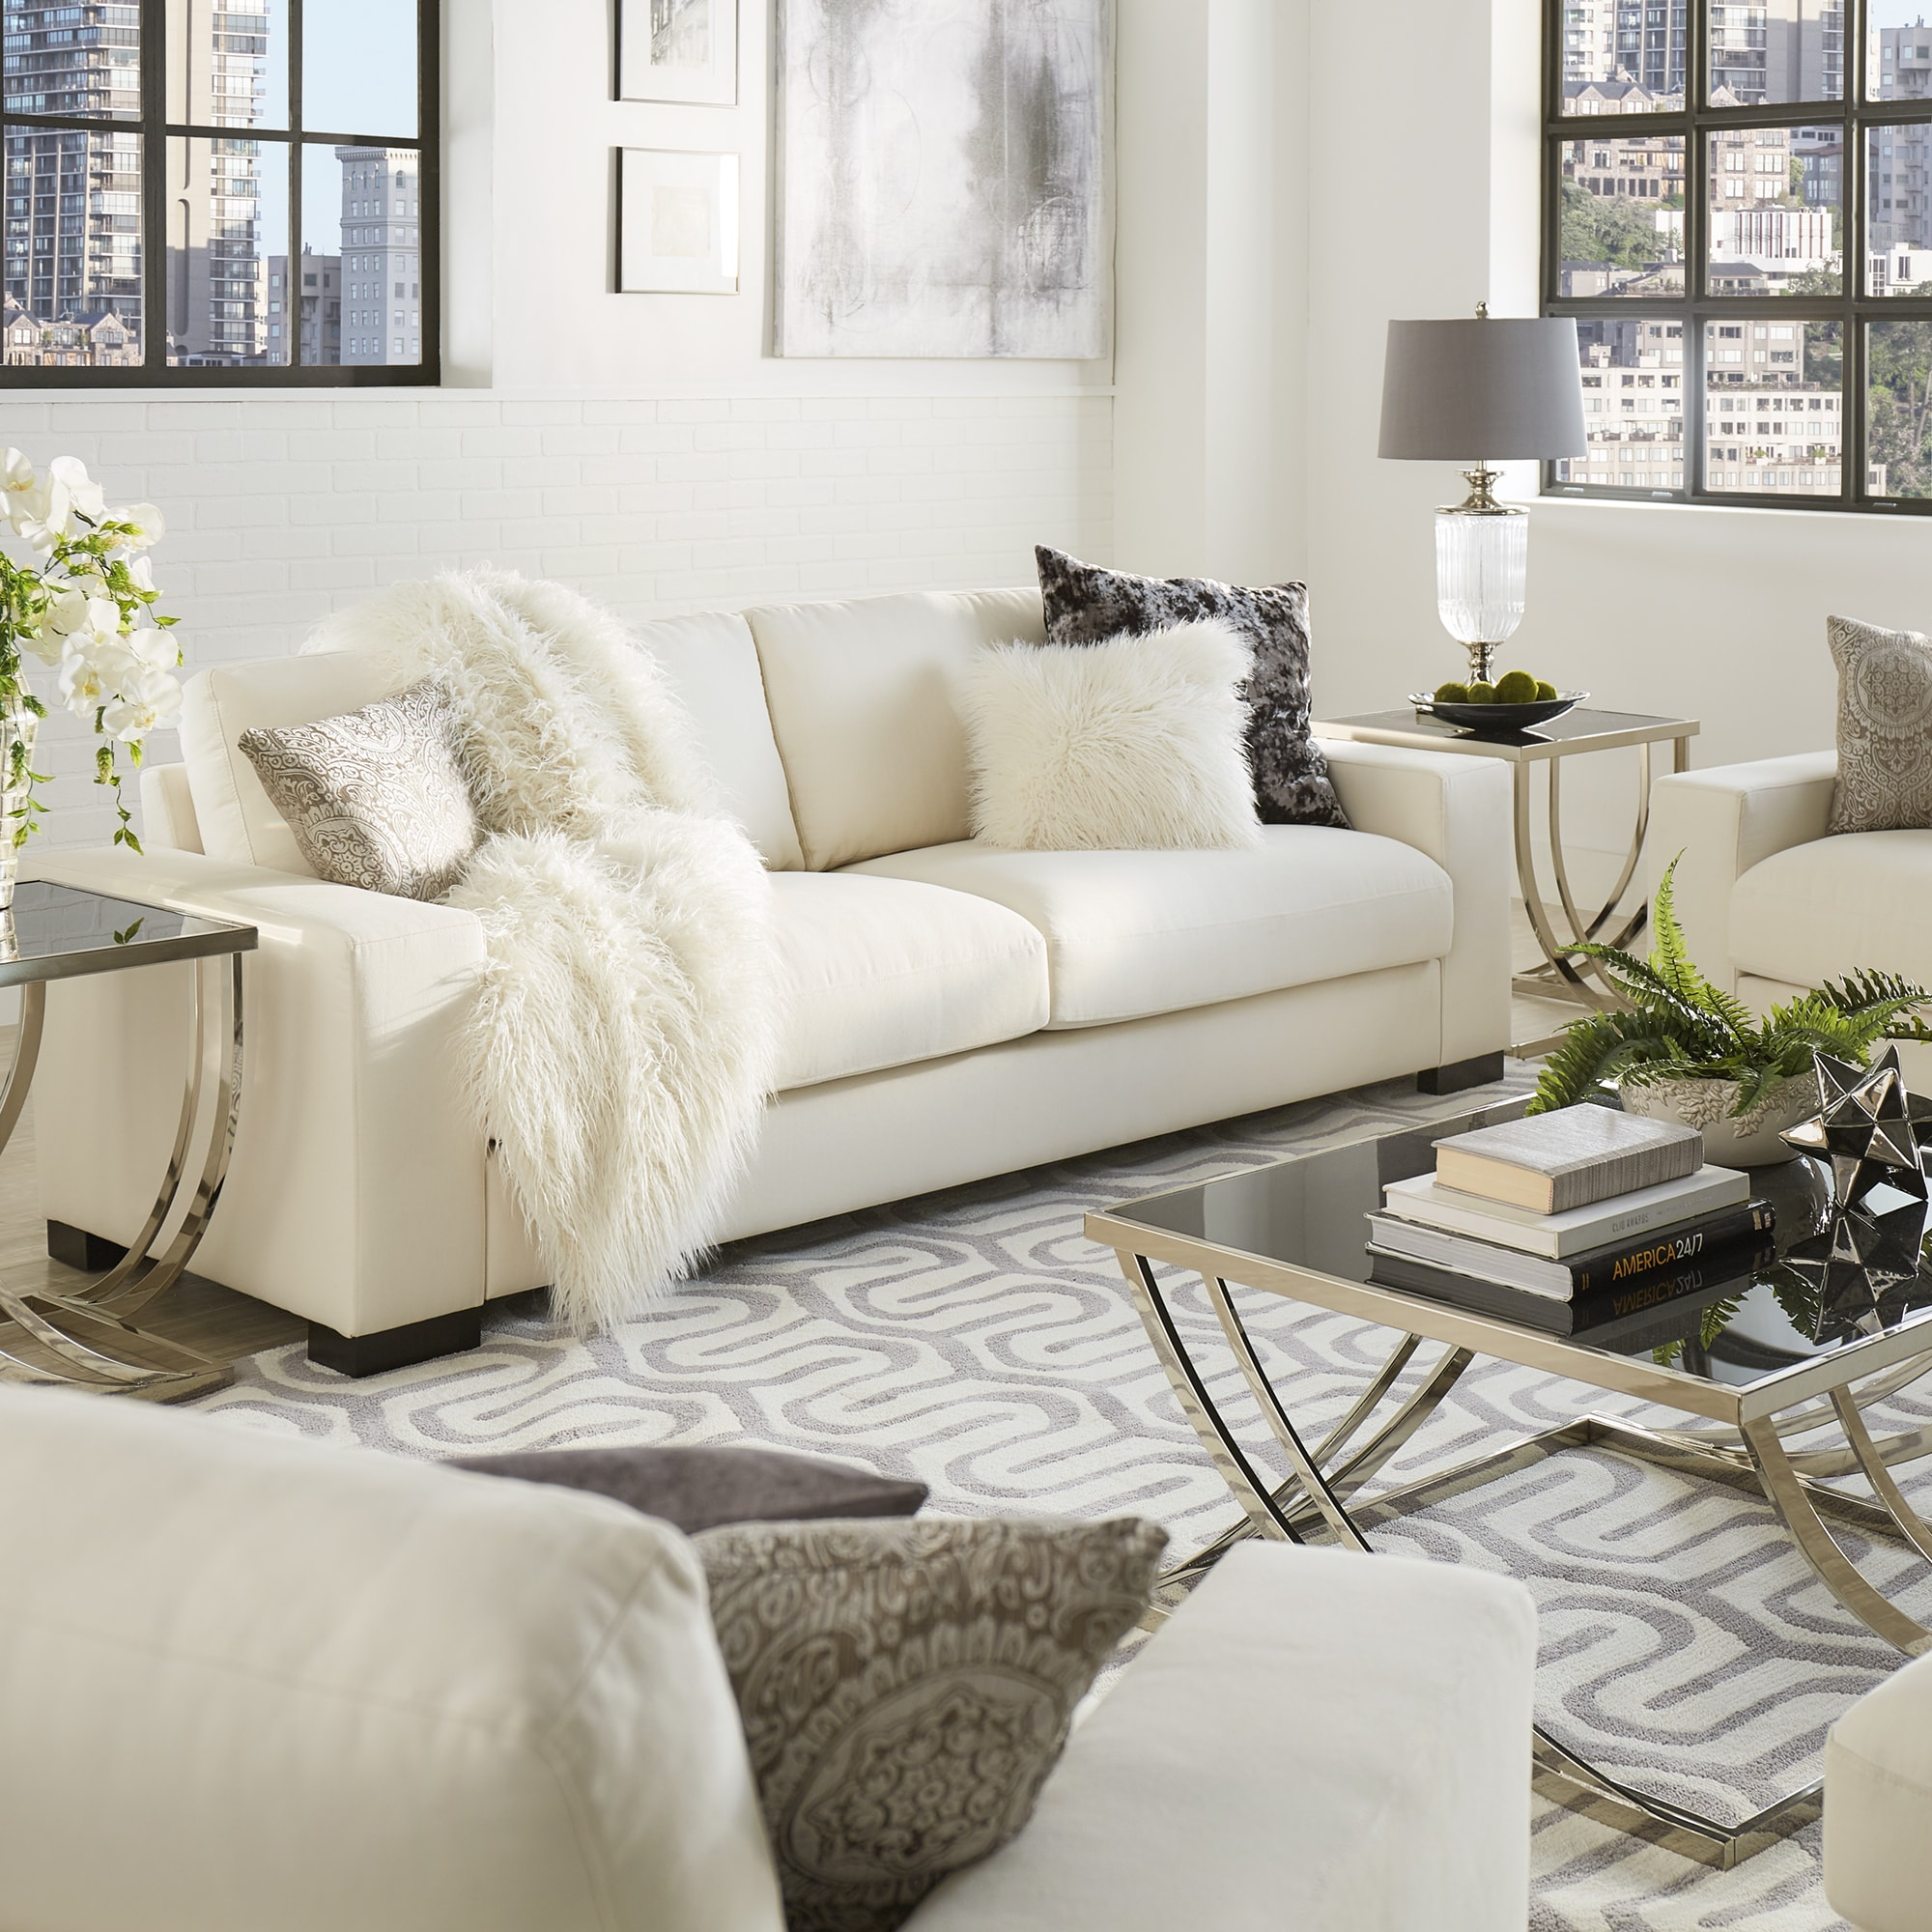 Sofa Cushion Filling Design Inspiration Creative Types Of Interior Rh Krvainc Com